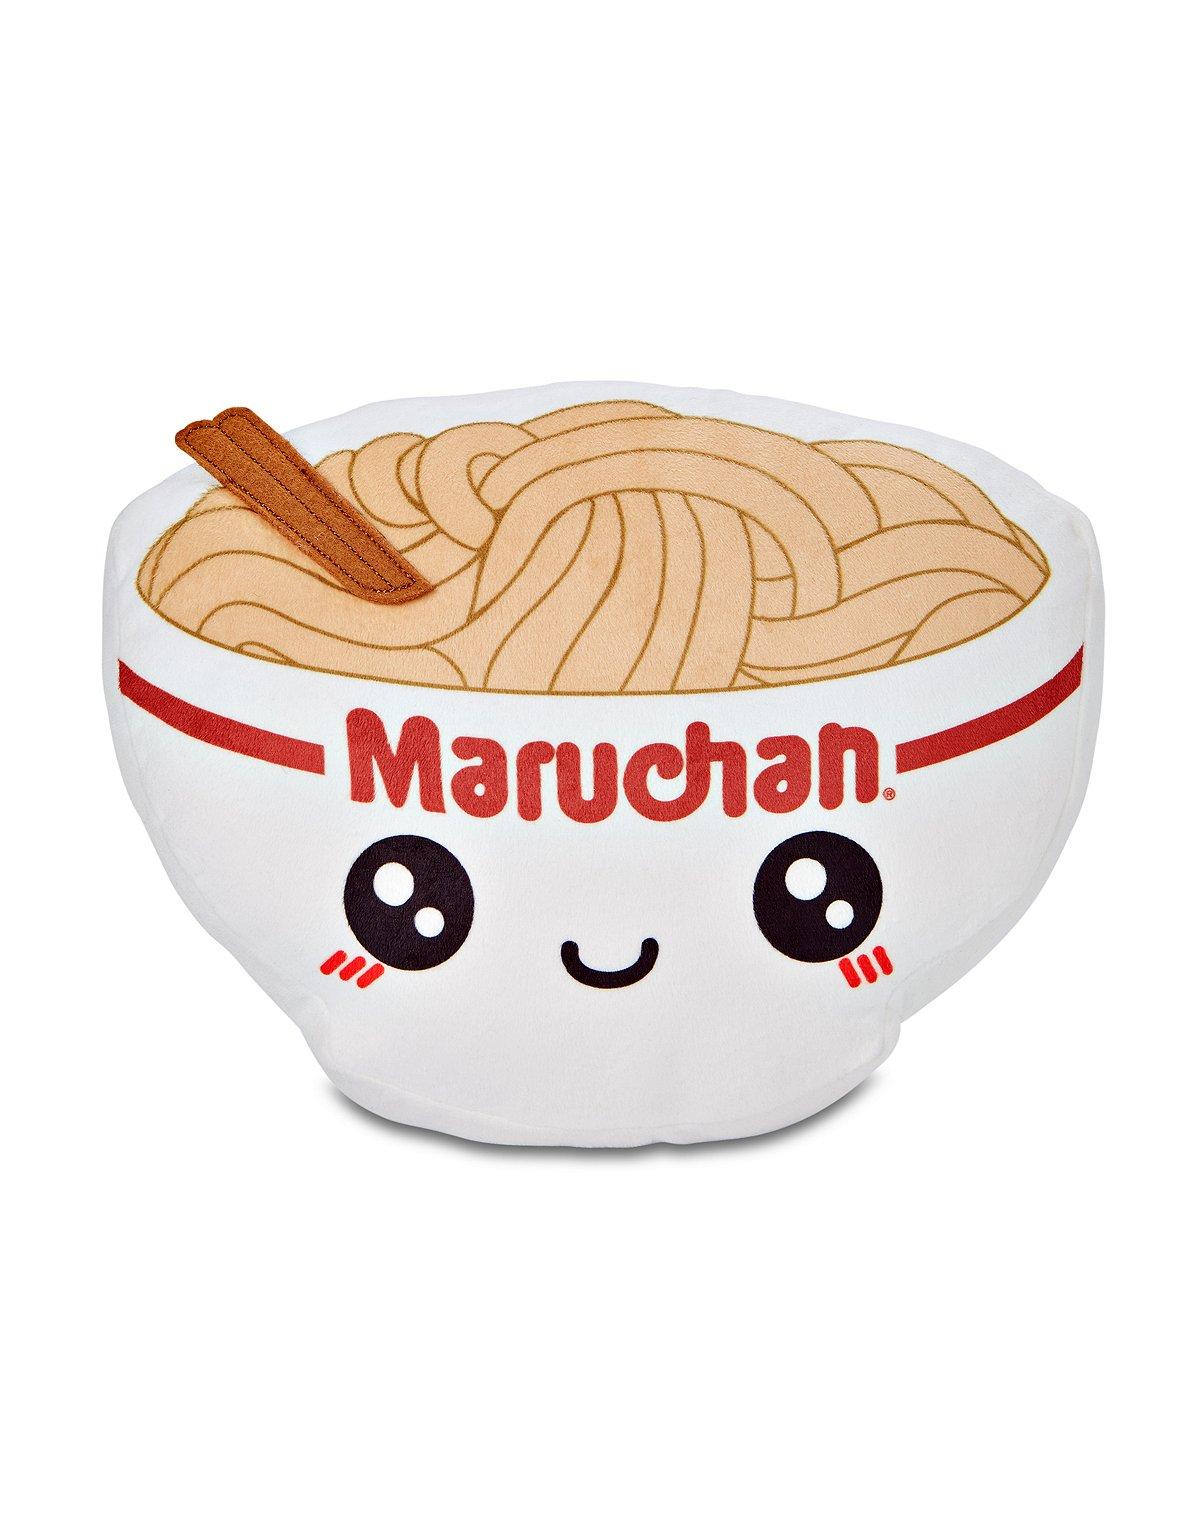 Maruchan Ramen Pillow - Maruchan